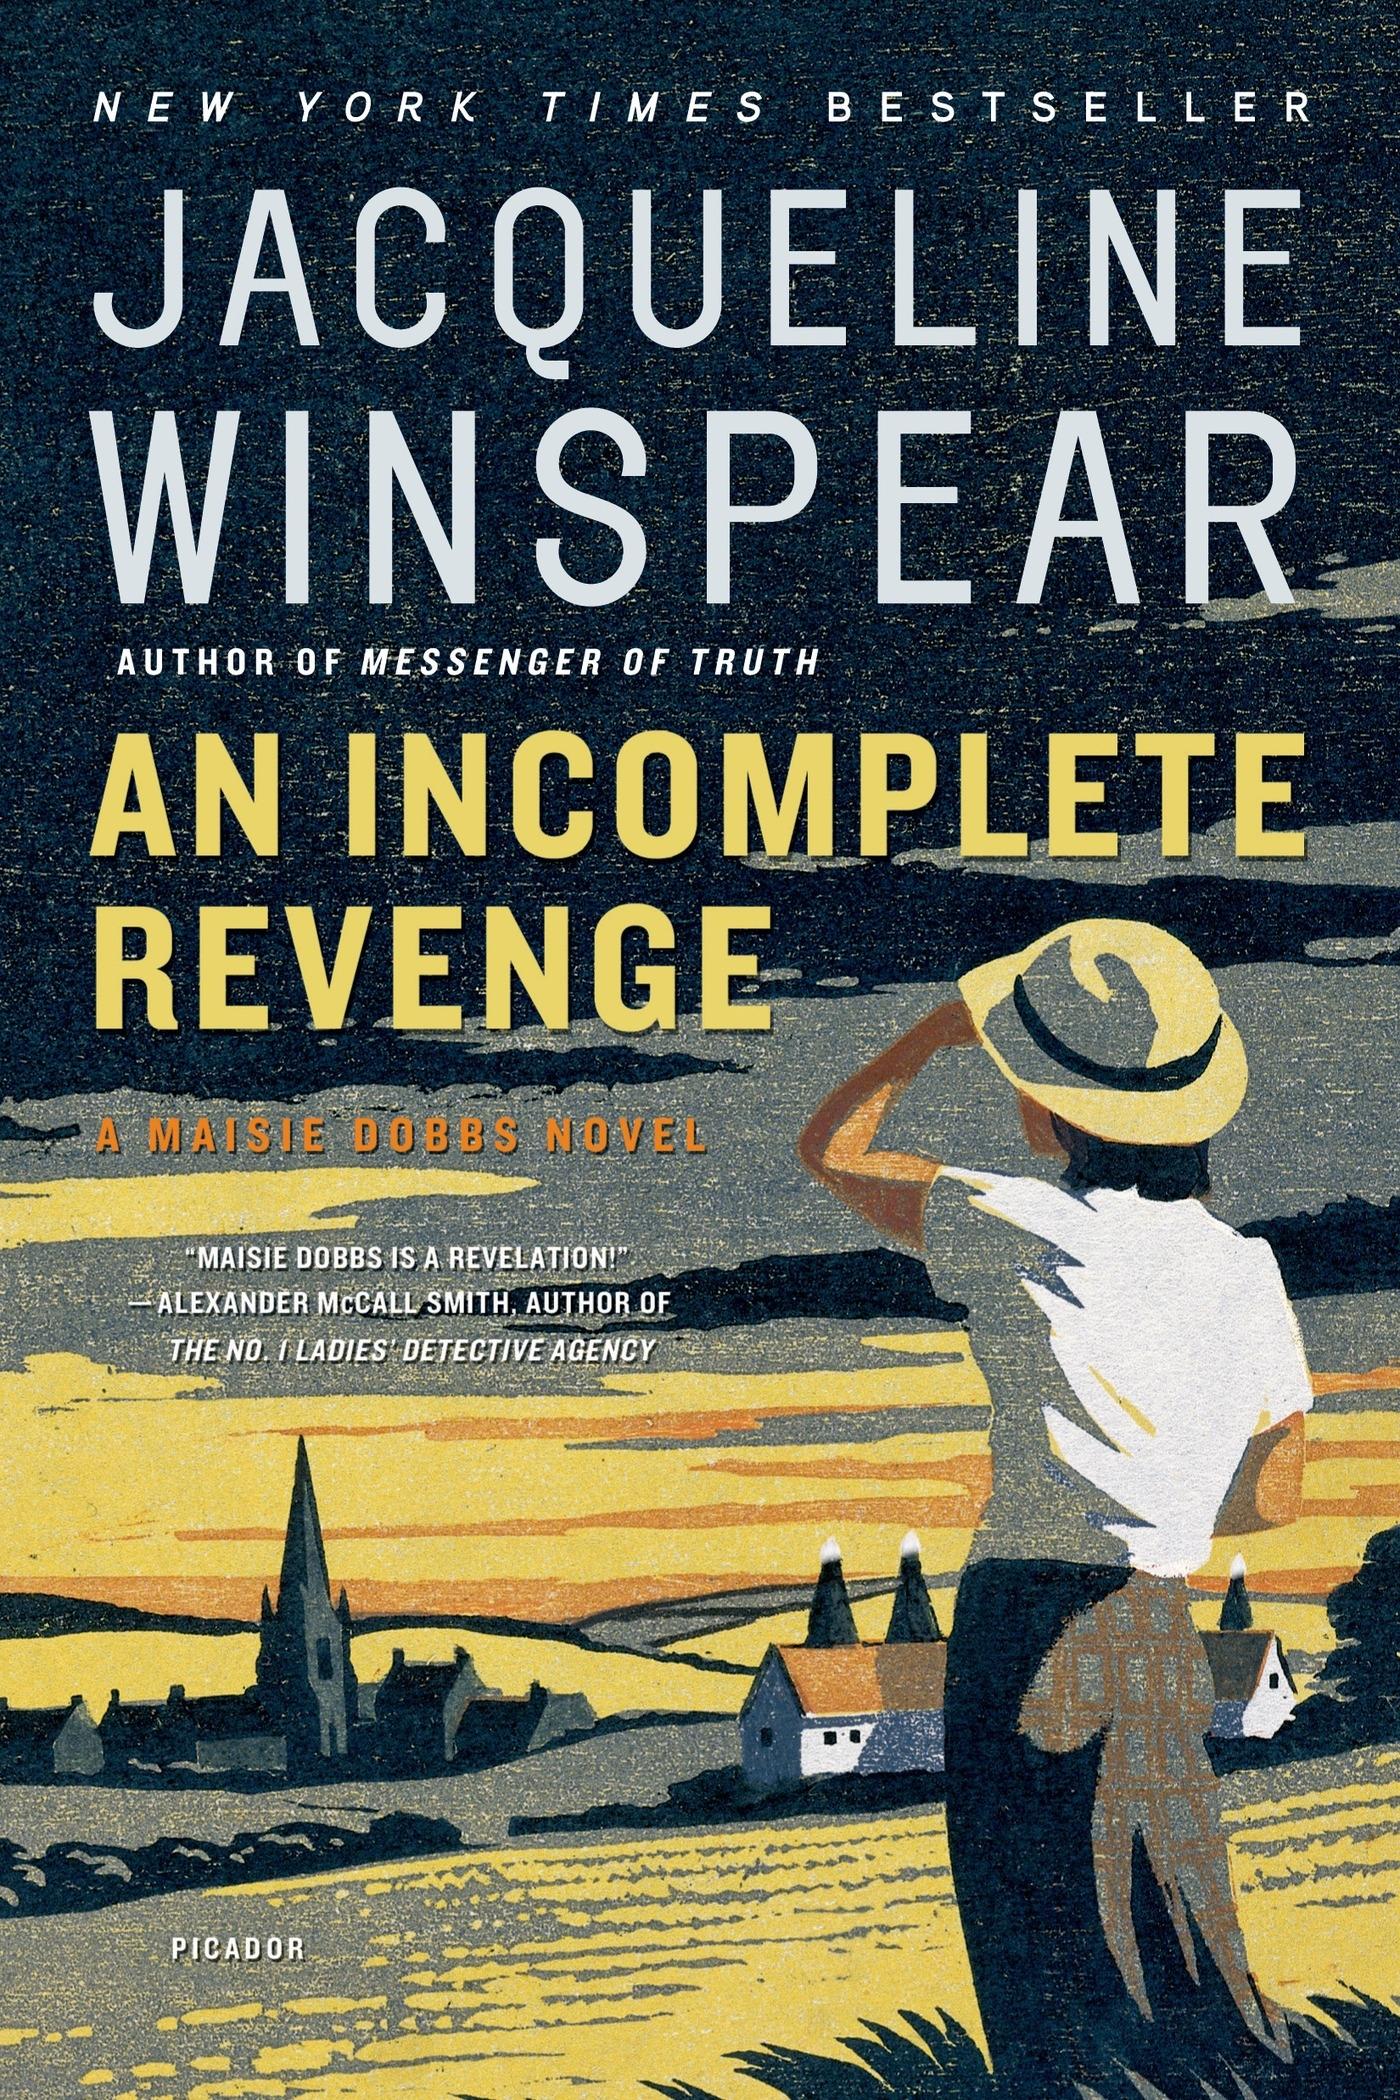 An incomplete revenge : a Maisie Dobbs novel